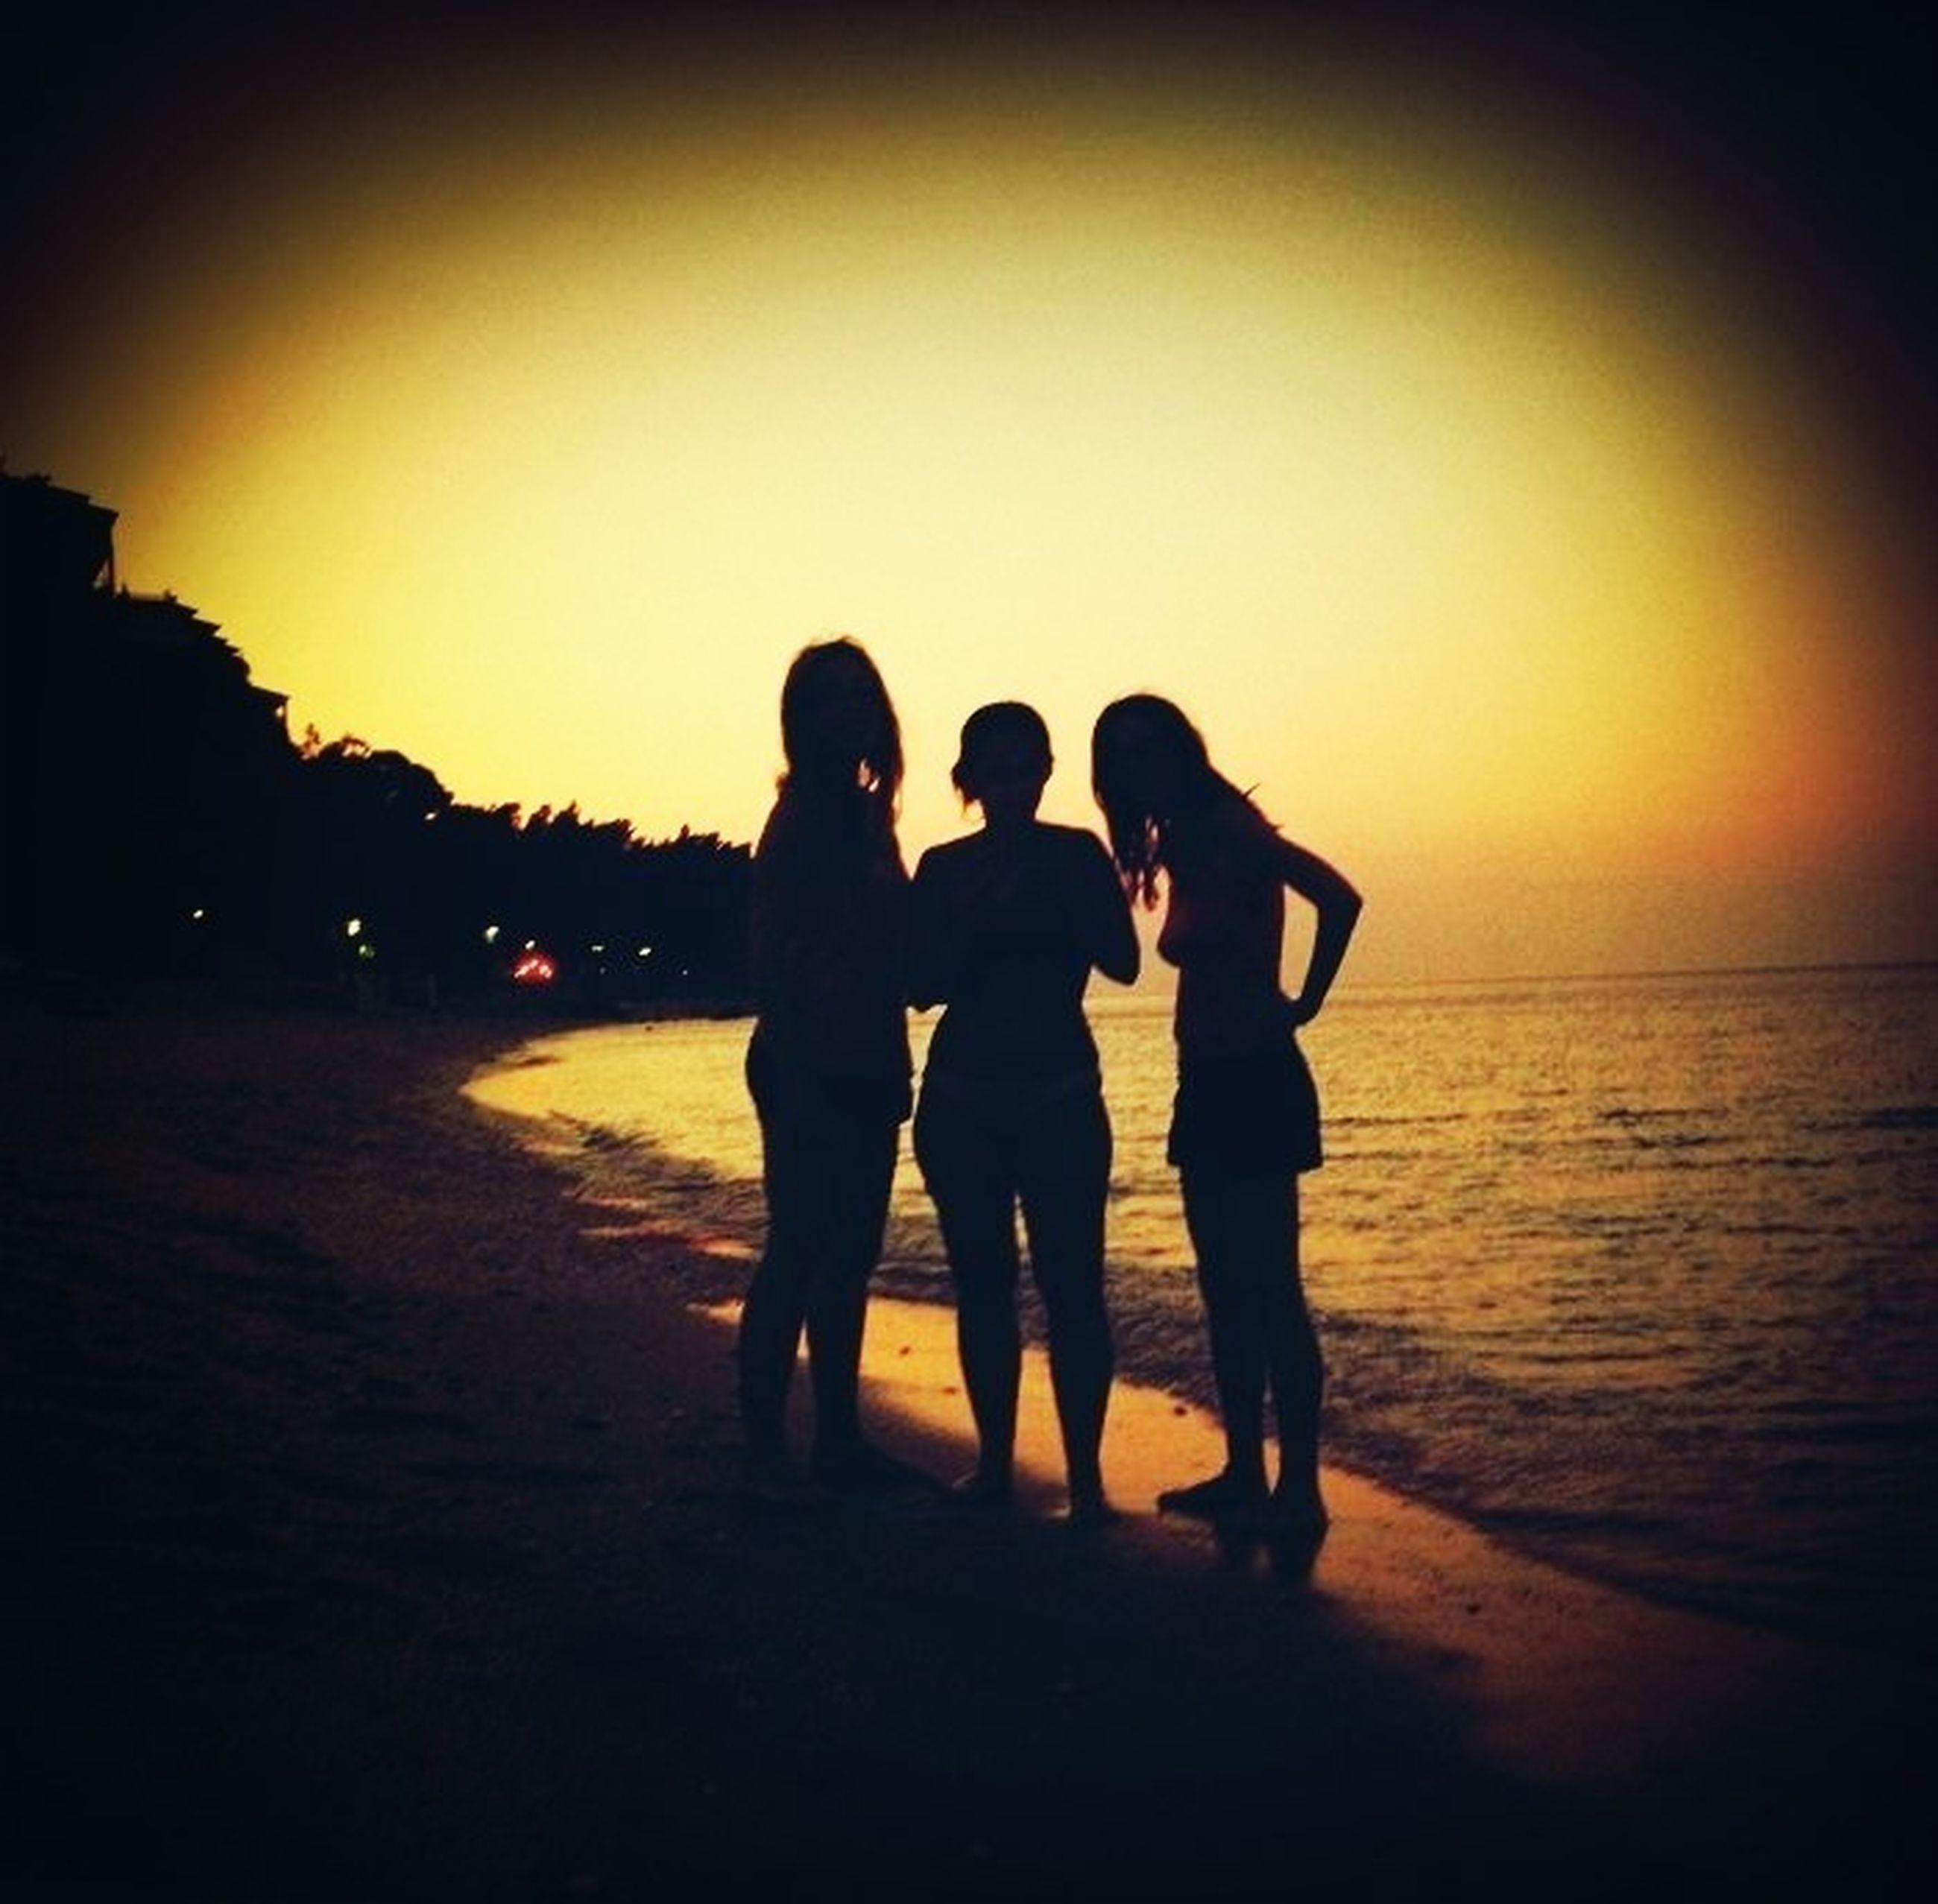 sunset, silhouette, togetherness, orange color, men, lifestyles, leisure activity, bonding, sea, beach, friendship, water, sun, sky, love, copy space, person, standing